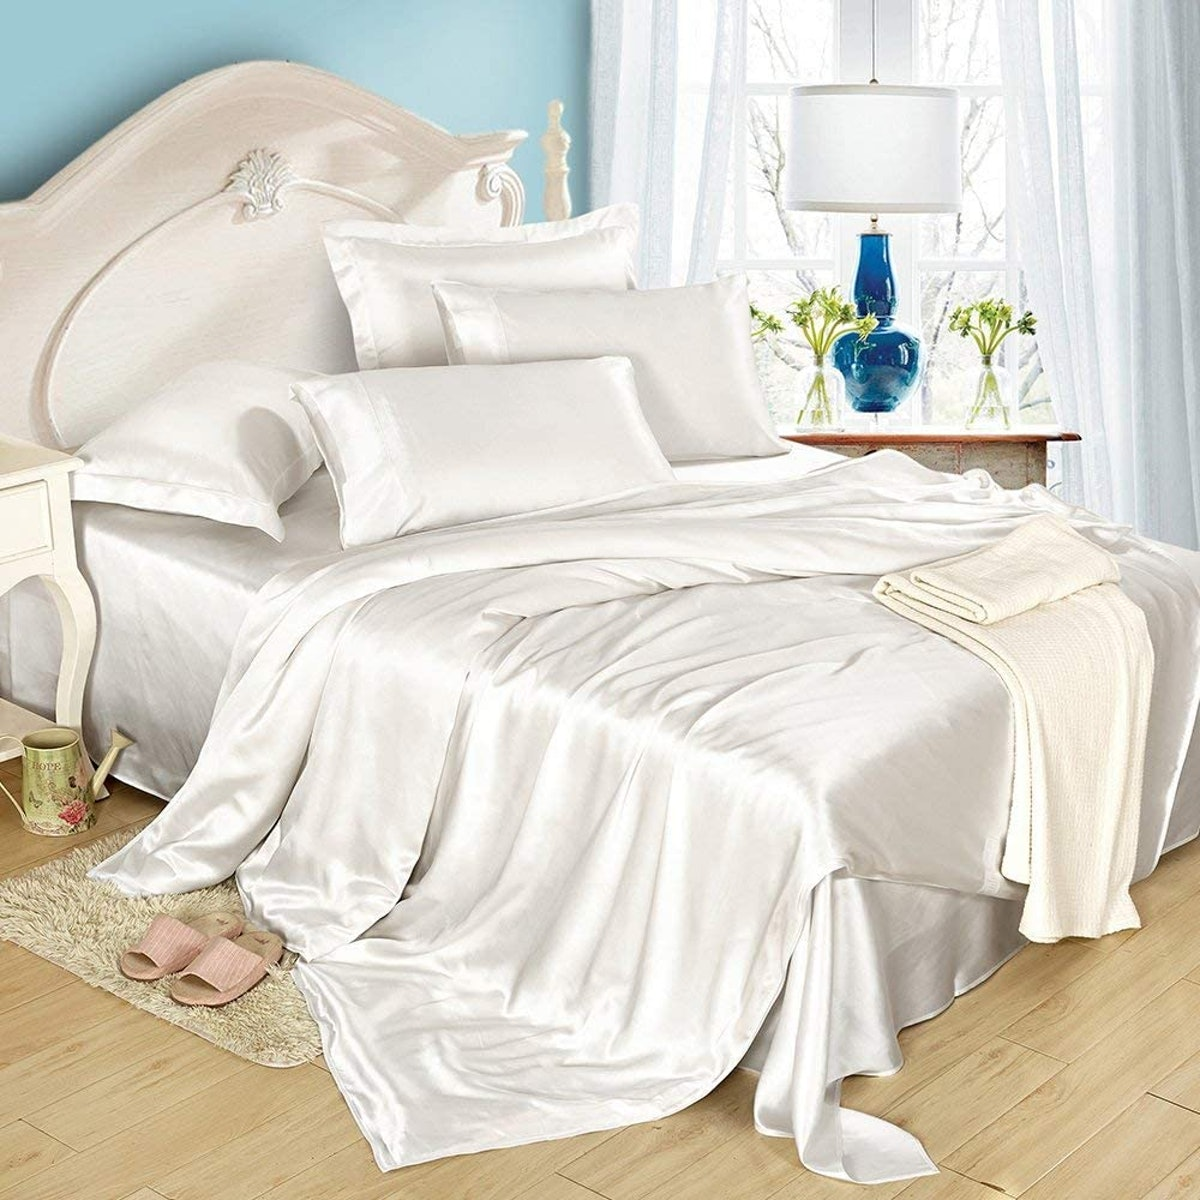 LilySilk 4Pcs Silk Bed Sheets